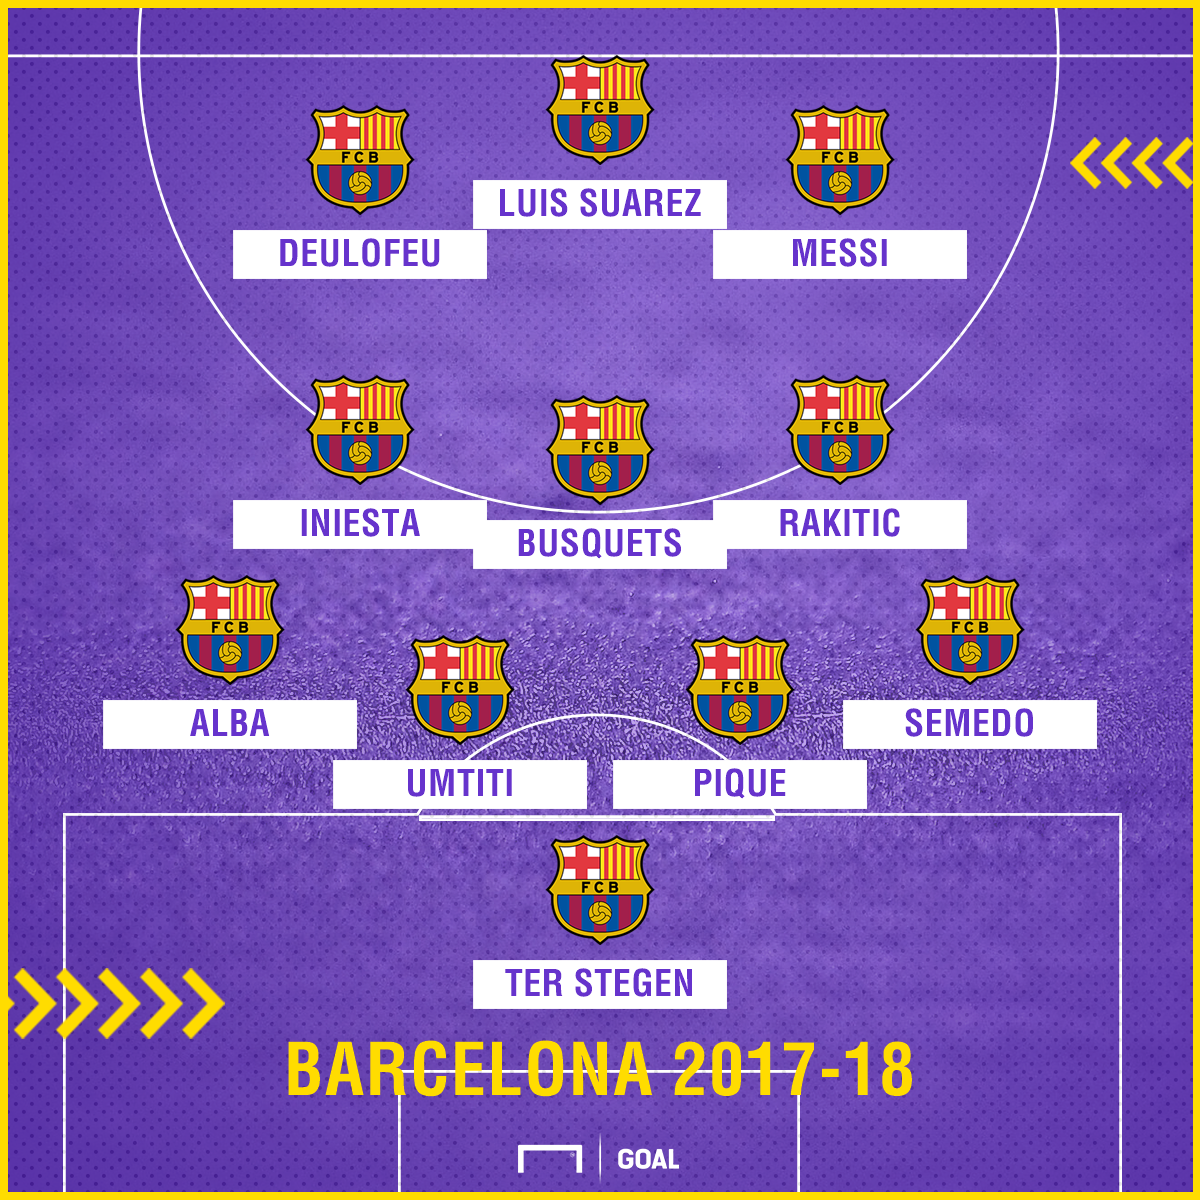 Barcelona 2017-18 graphic